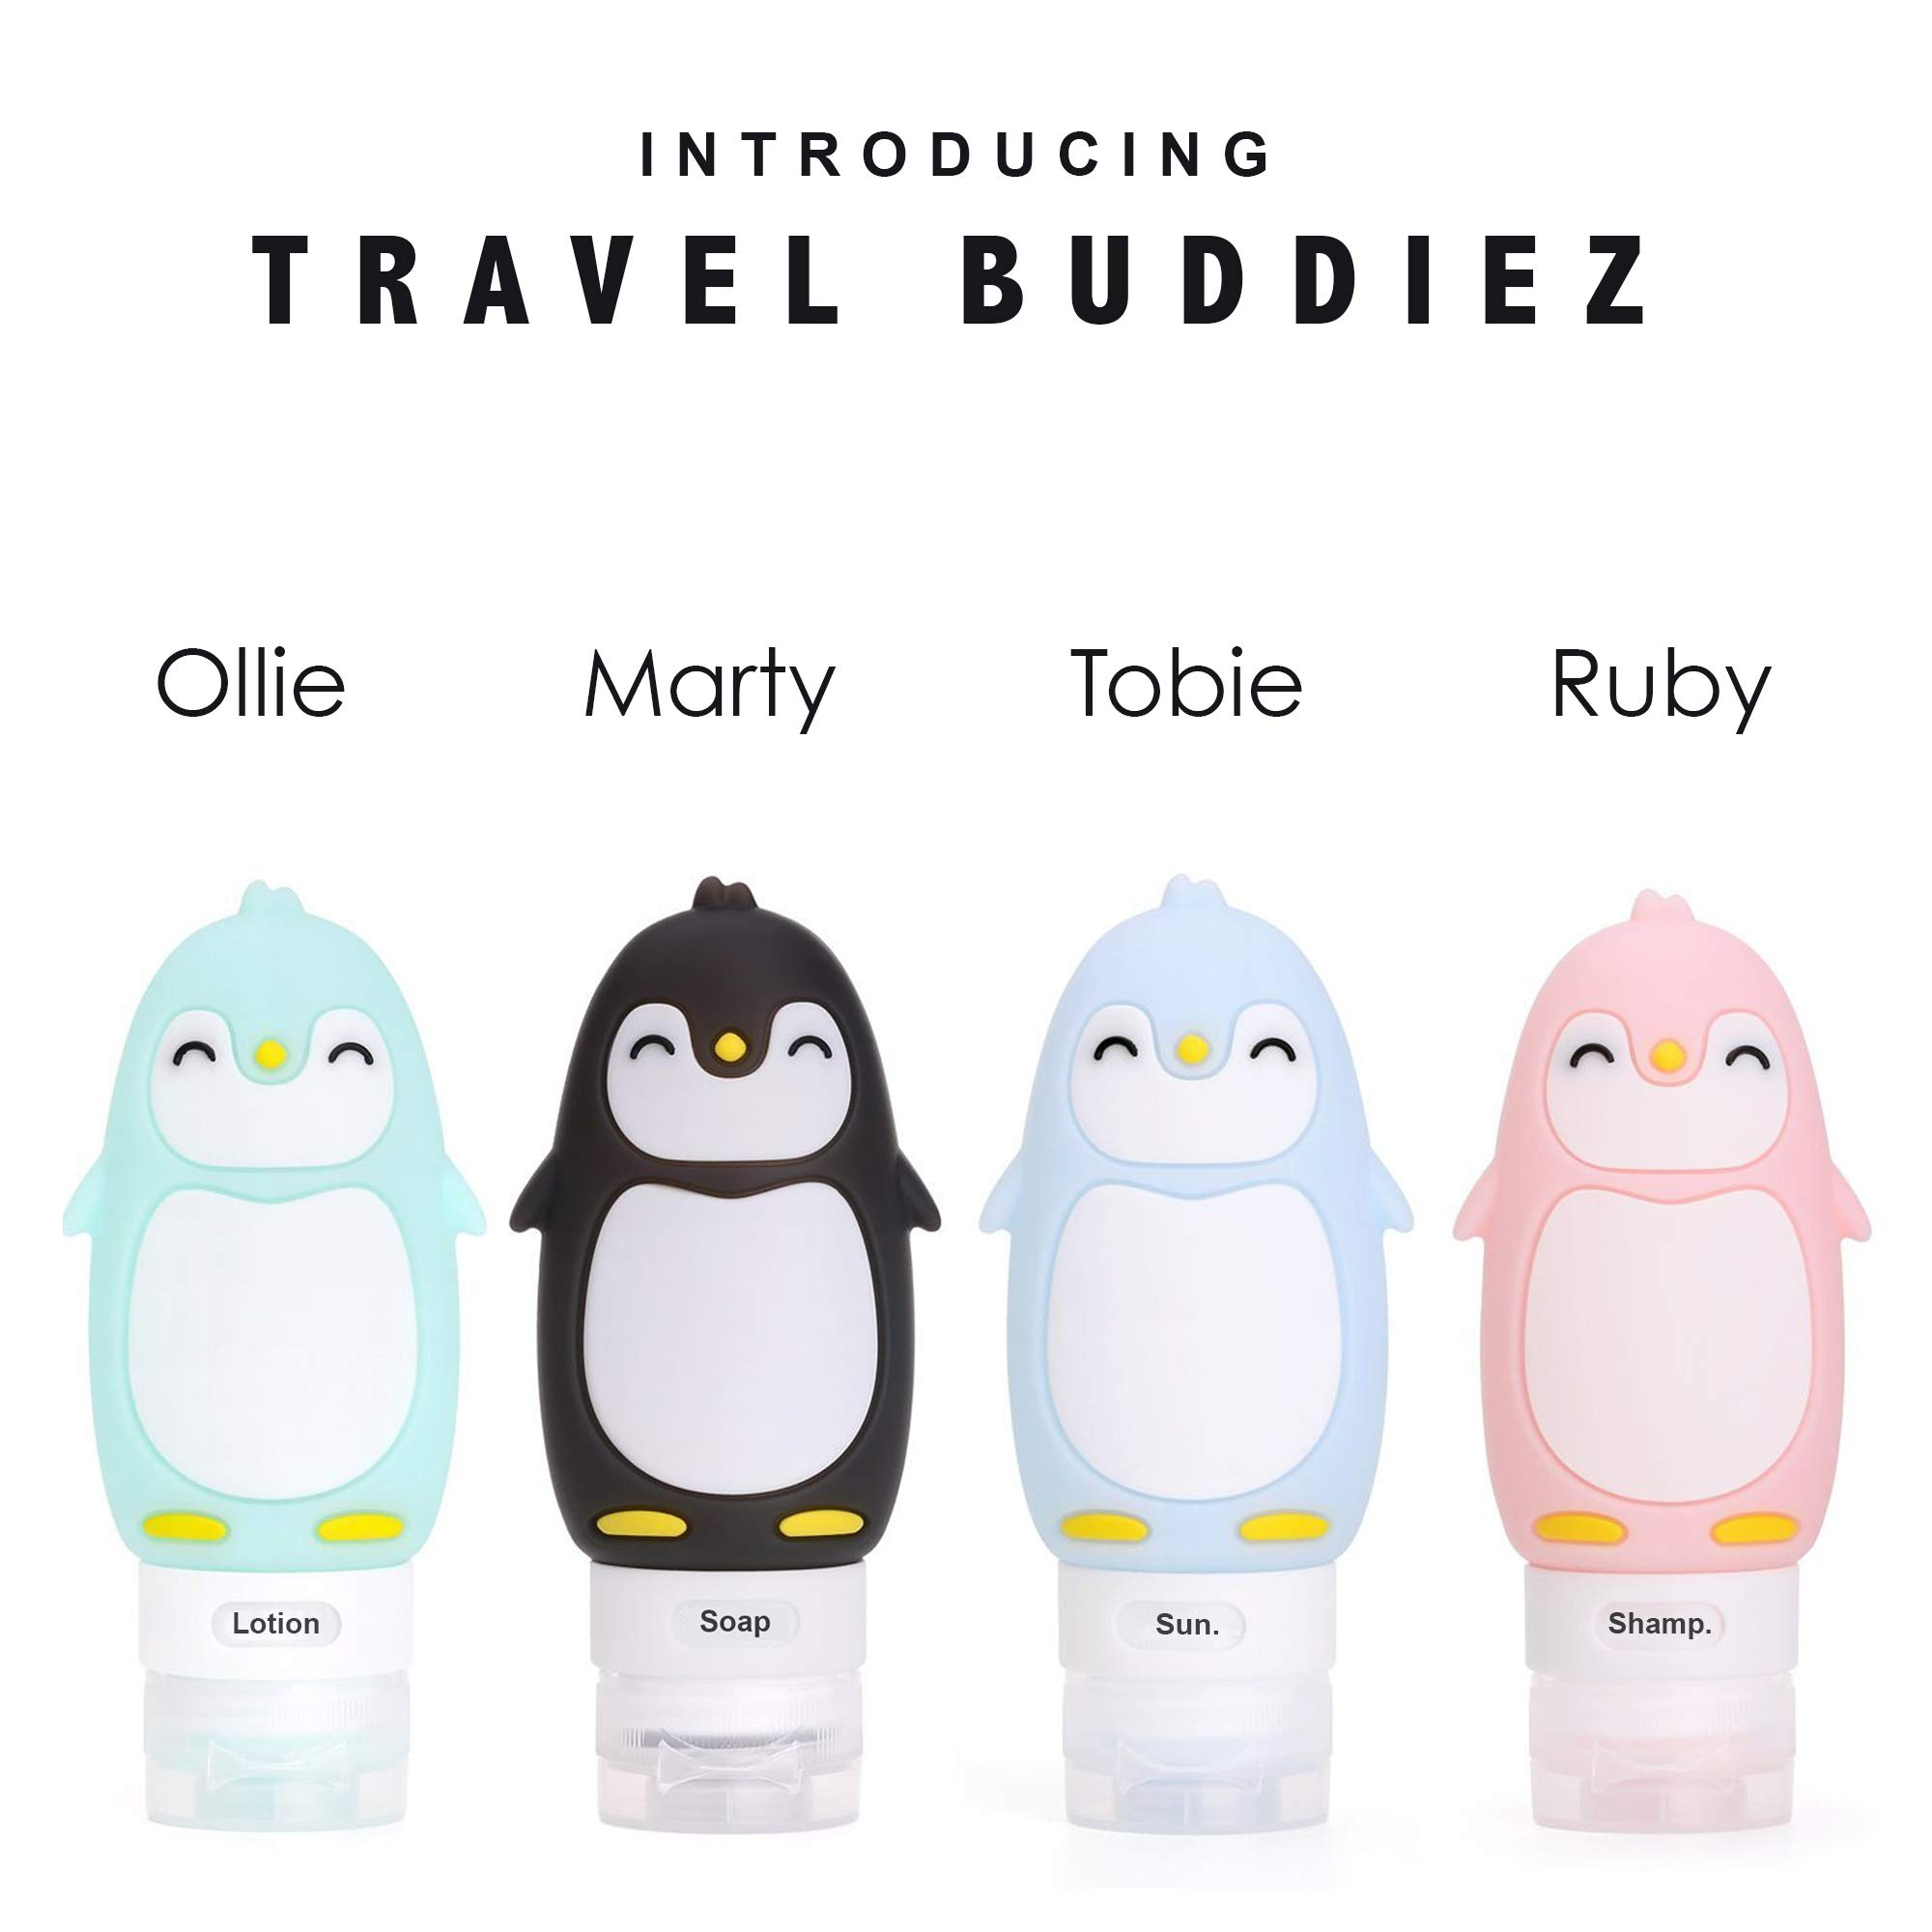 Kanga Care Travel Buddiez - Penguin Family (4 pack)